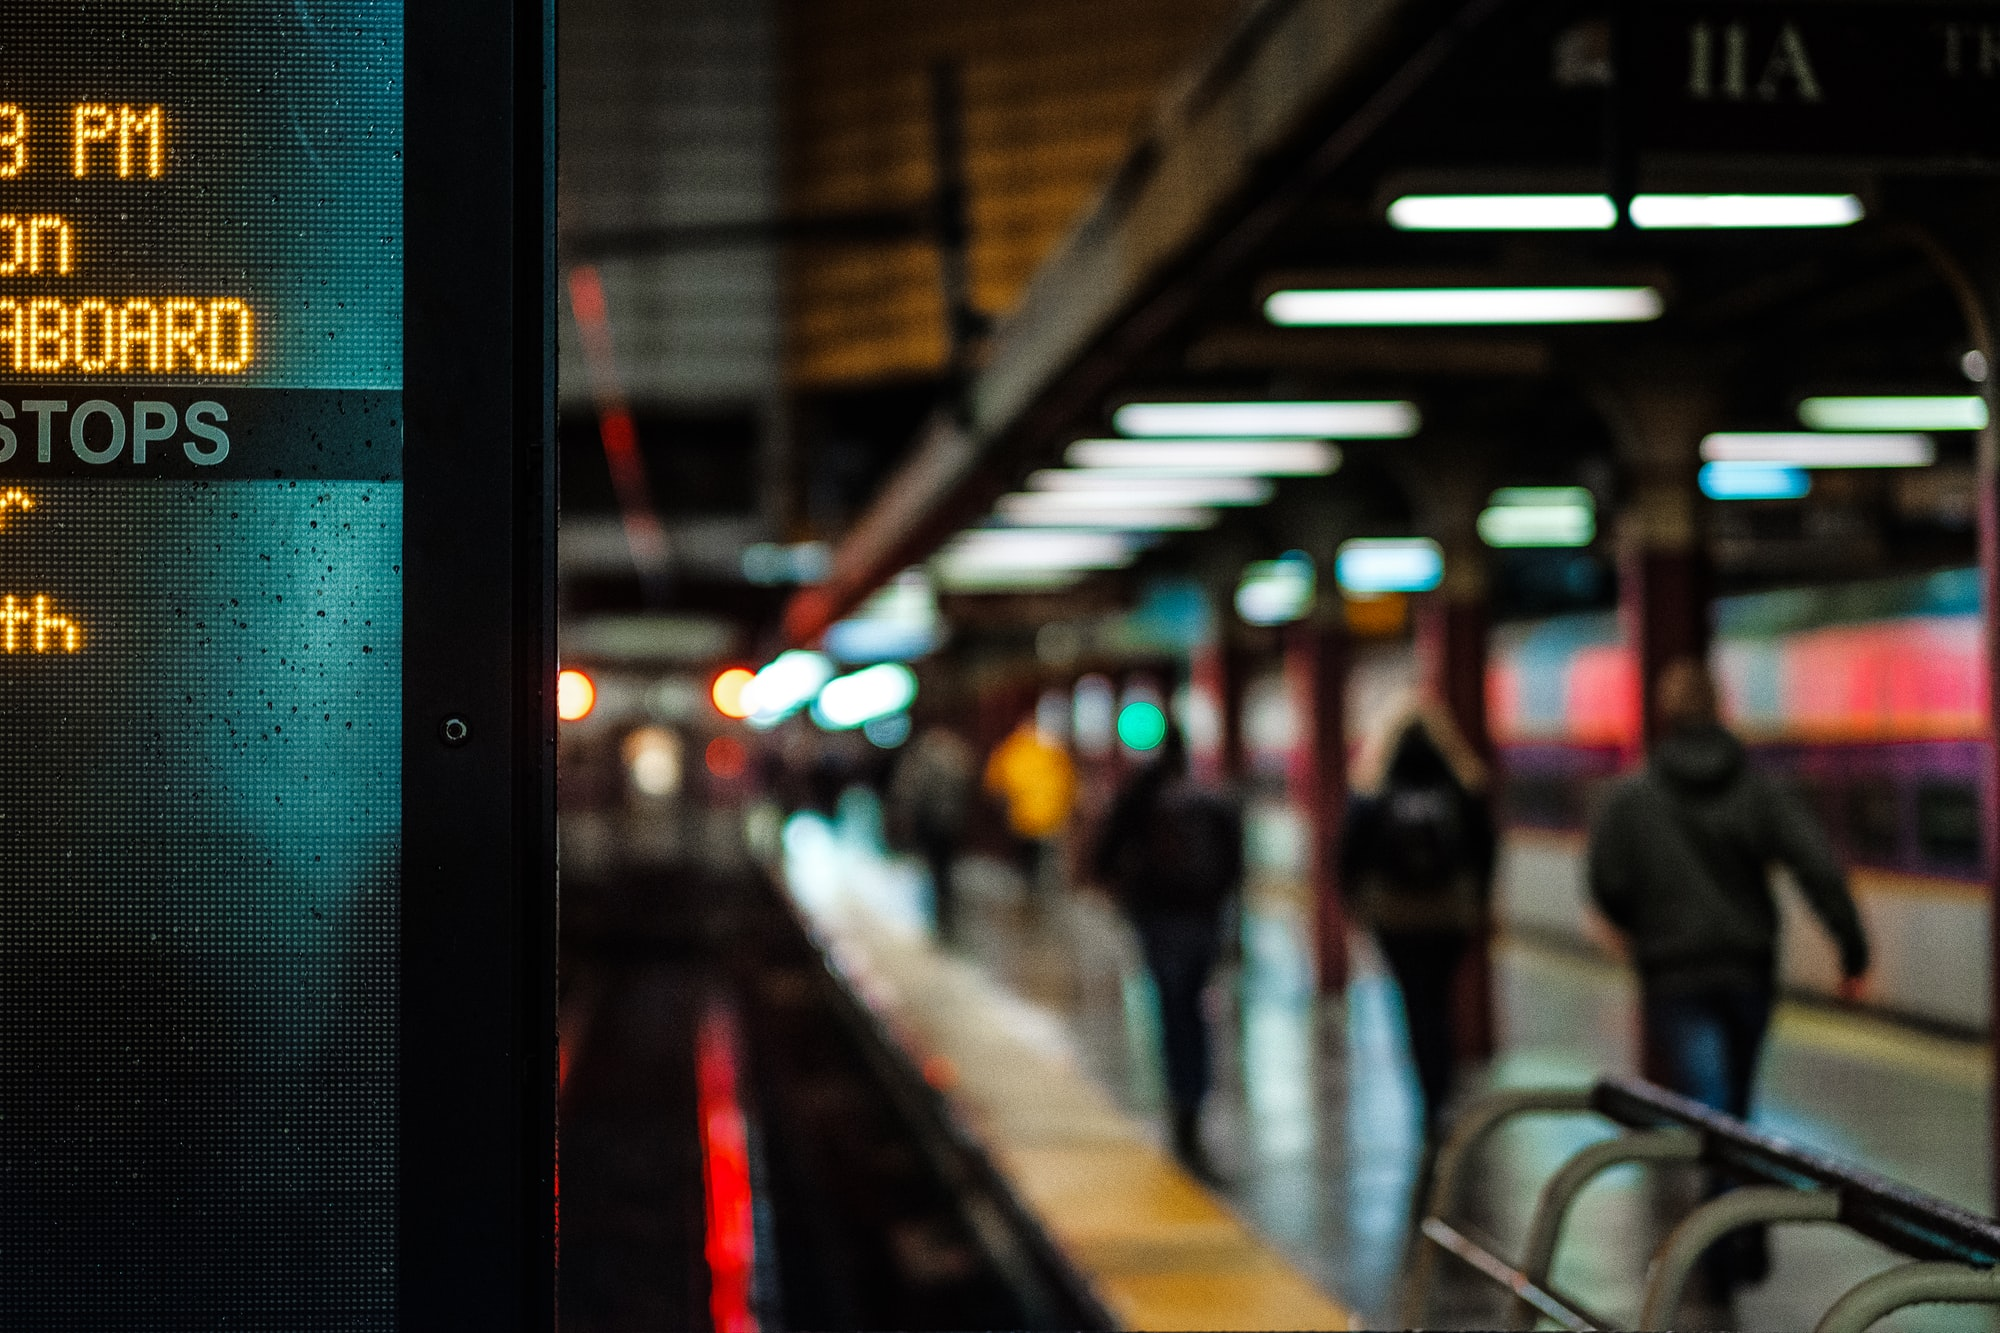 Urban Public Transportation